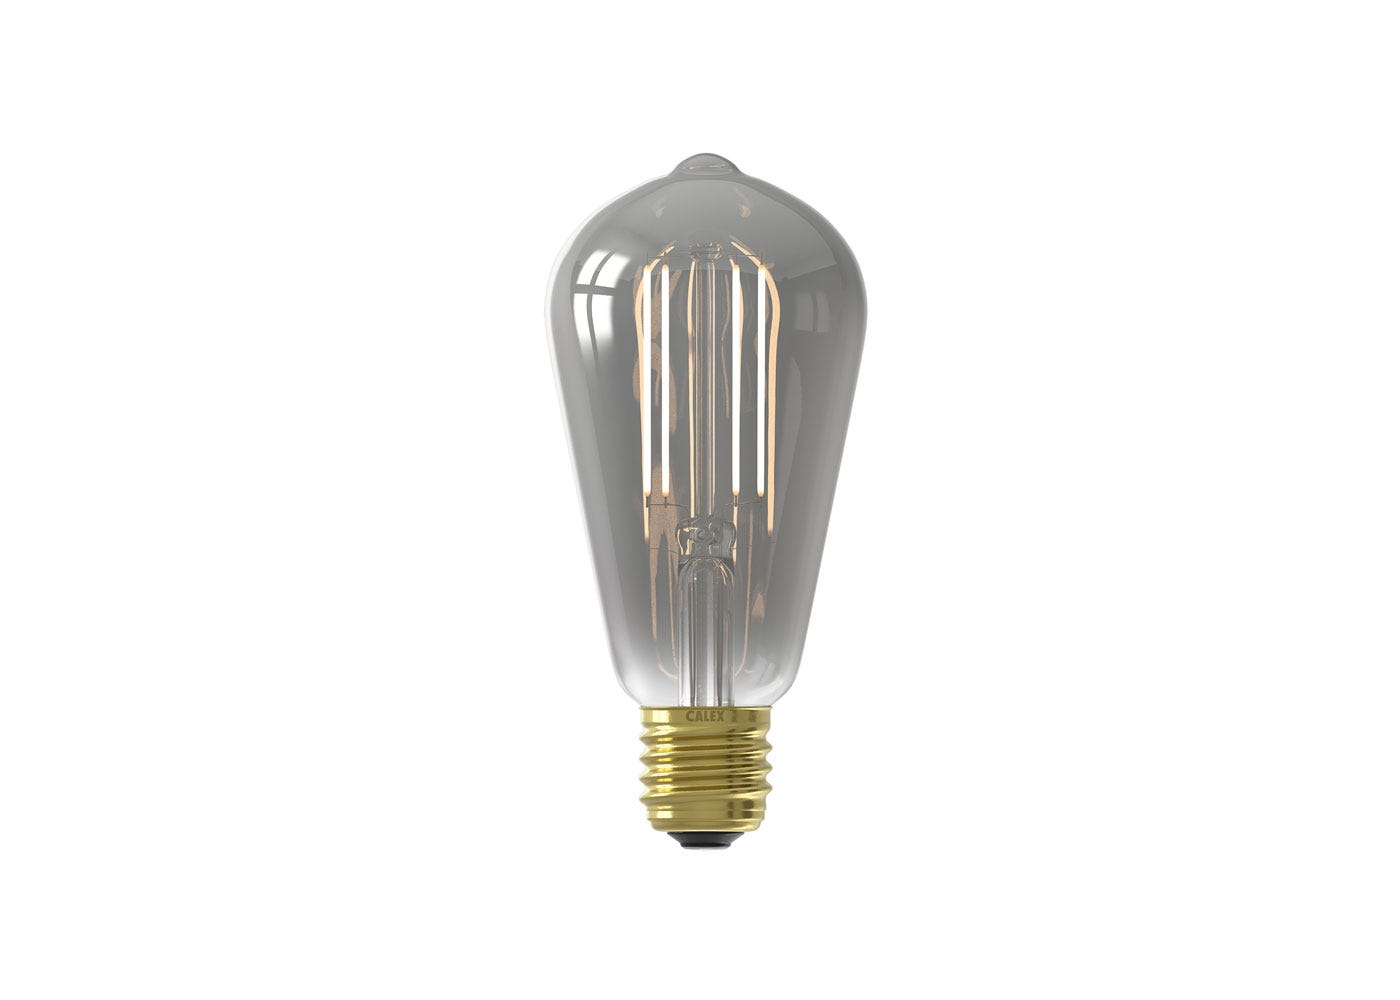 As shown: Smart LED Filament Rustic Smoke 7W E27 - On